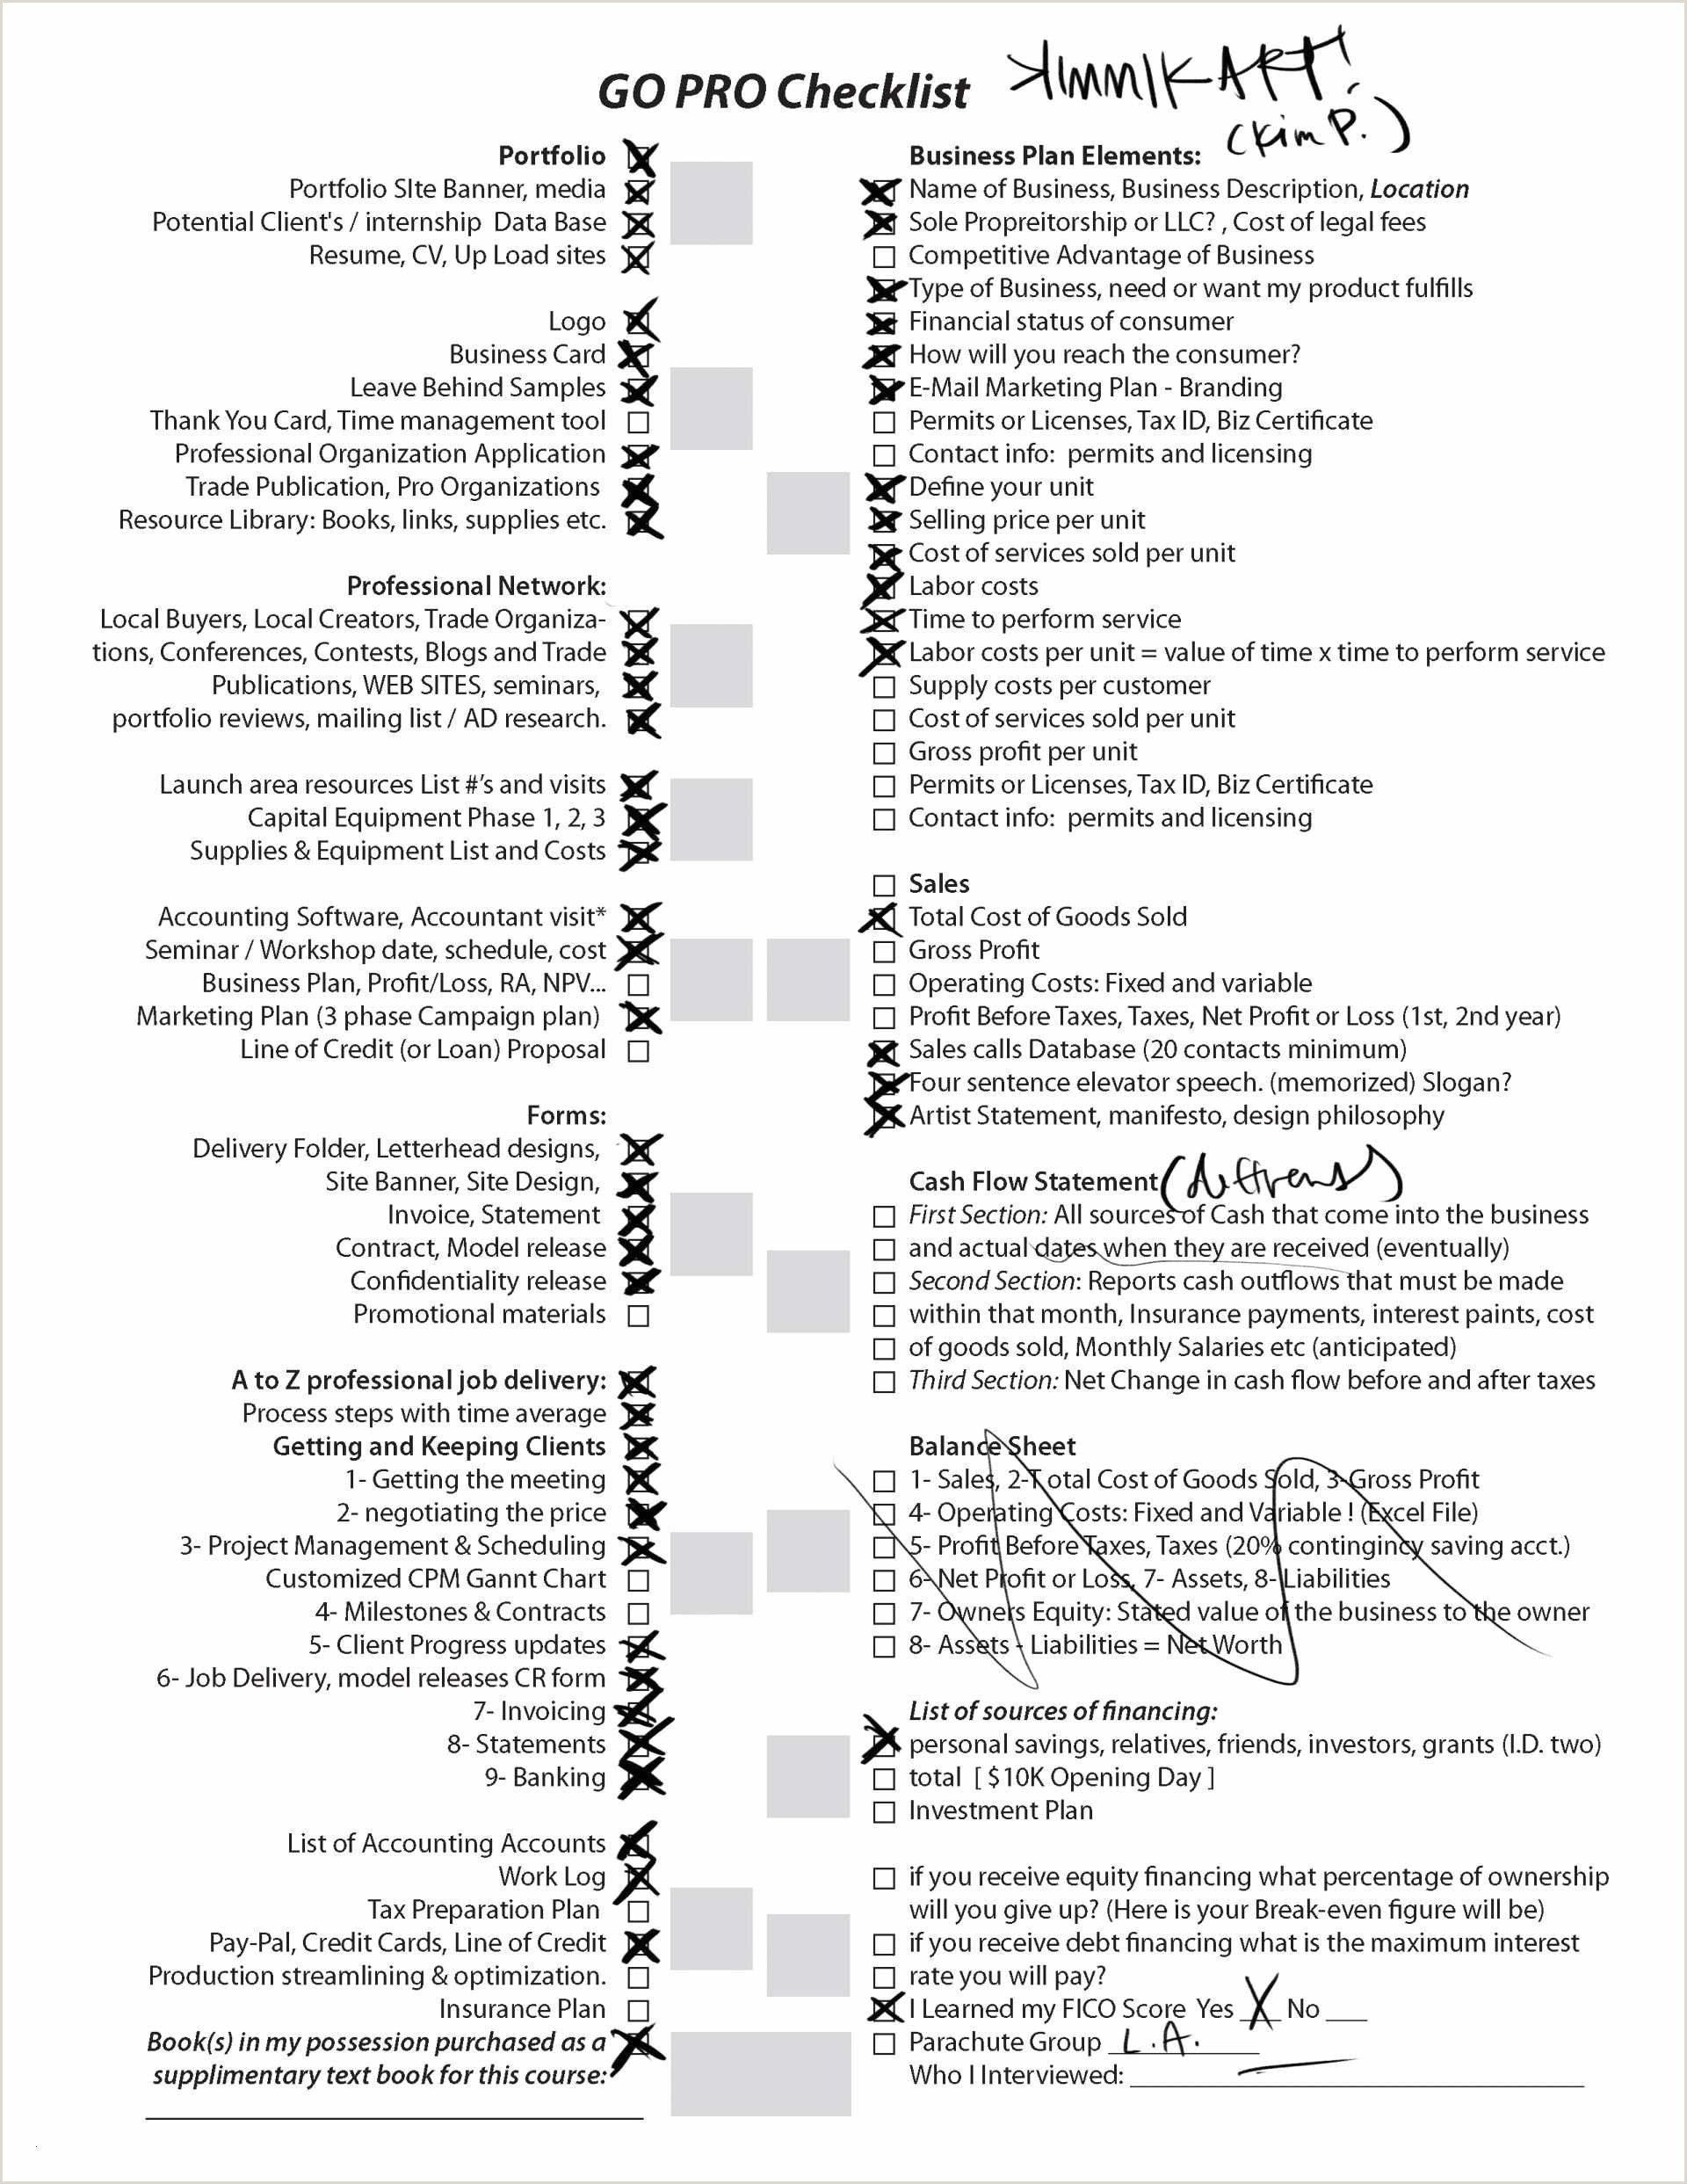 Mini Business Card Template Free Restaurant Iness Plan Excel Template Xls Spreadsheet